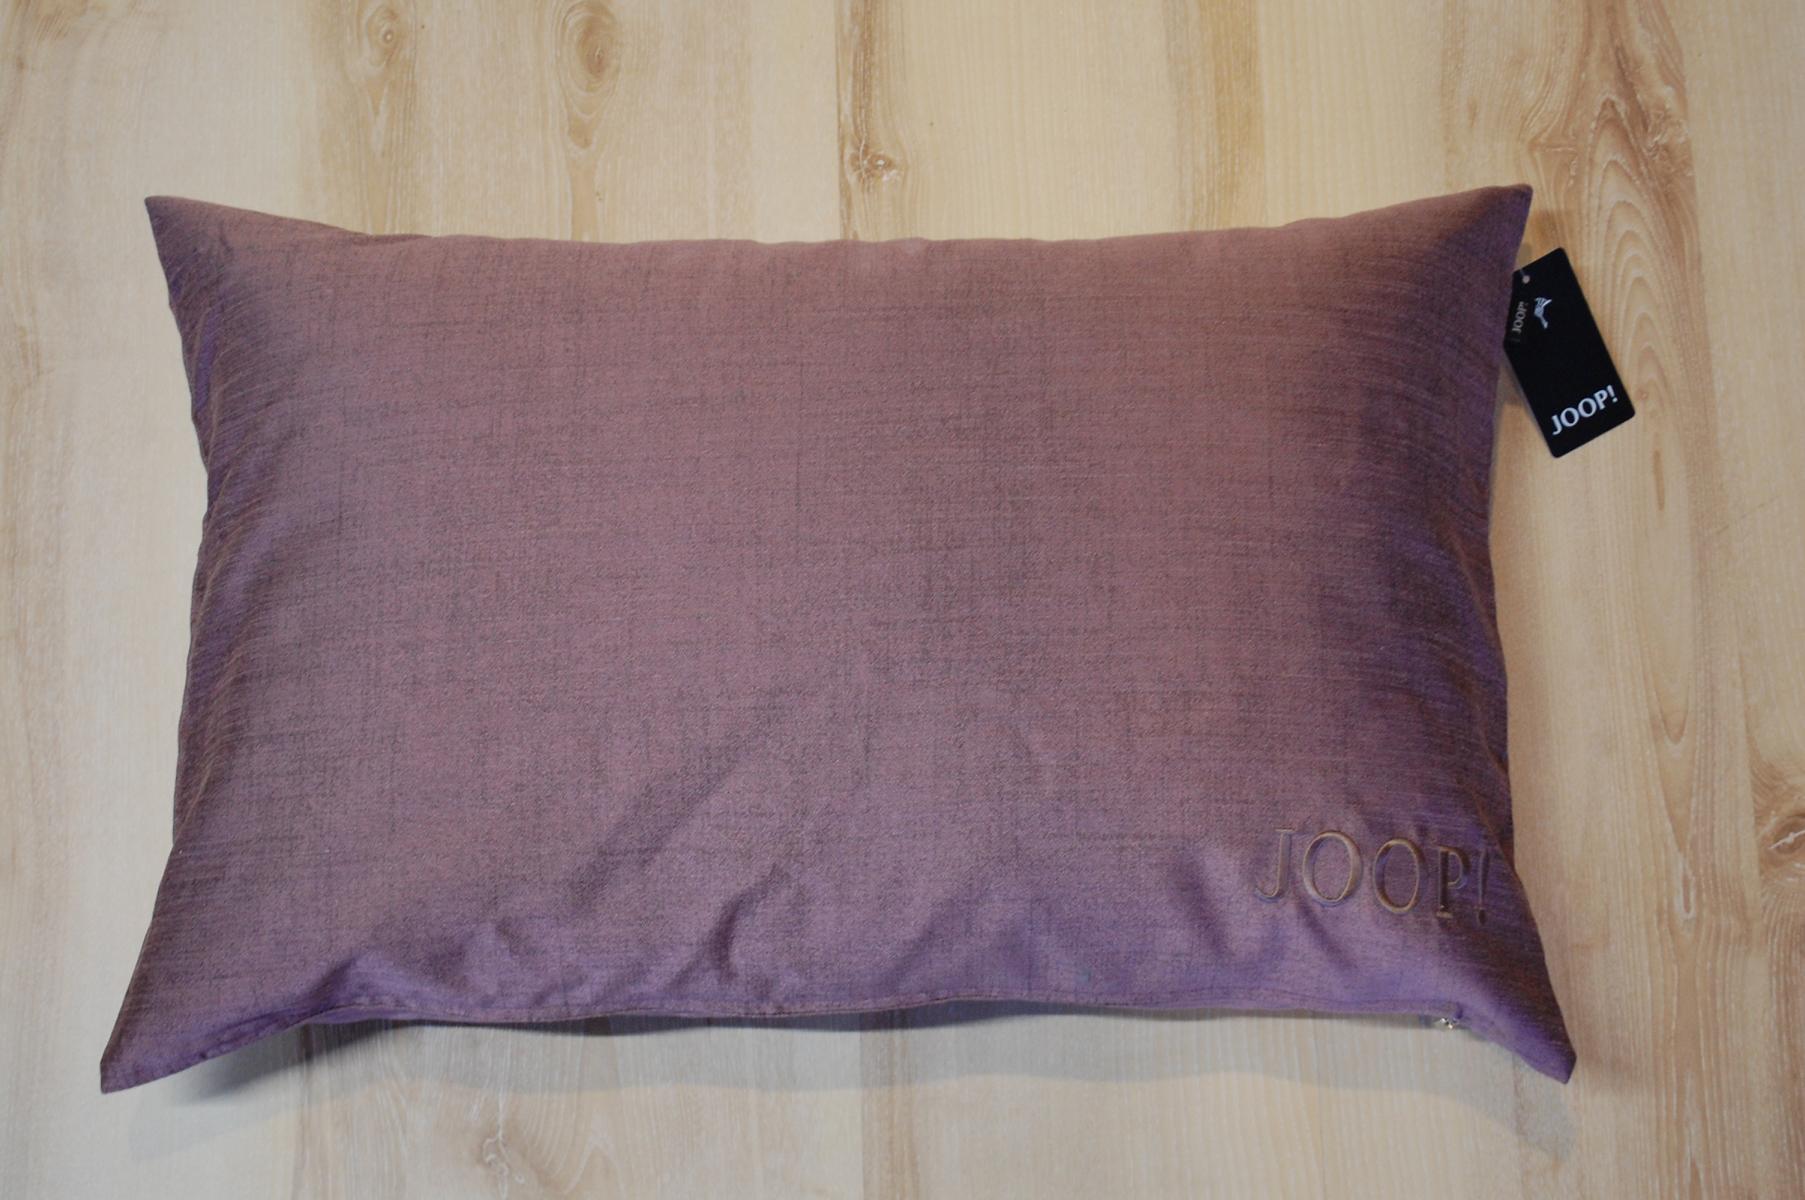 joop kissen texture 70522 075 rose 40x60 cm inkl federf llung 4005414275118 ebay. Black Bedroom Furniture Sets. Home Design Ideas